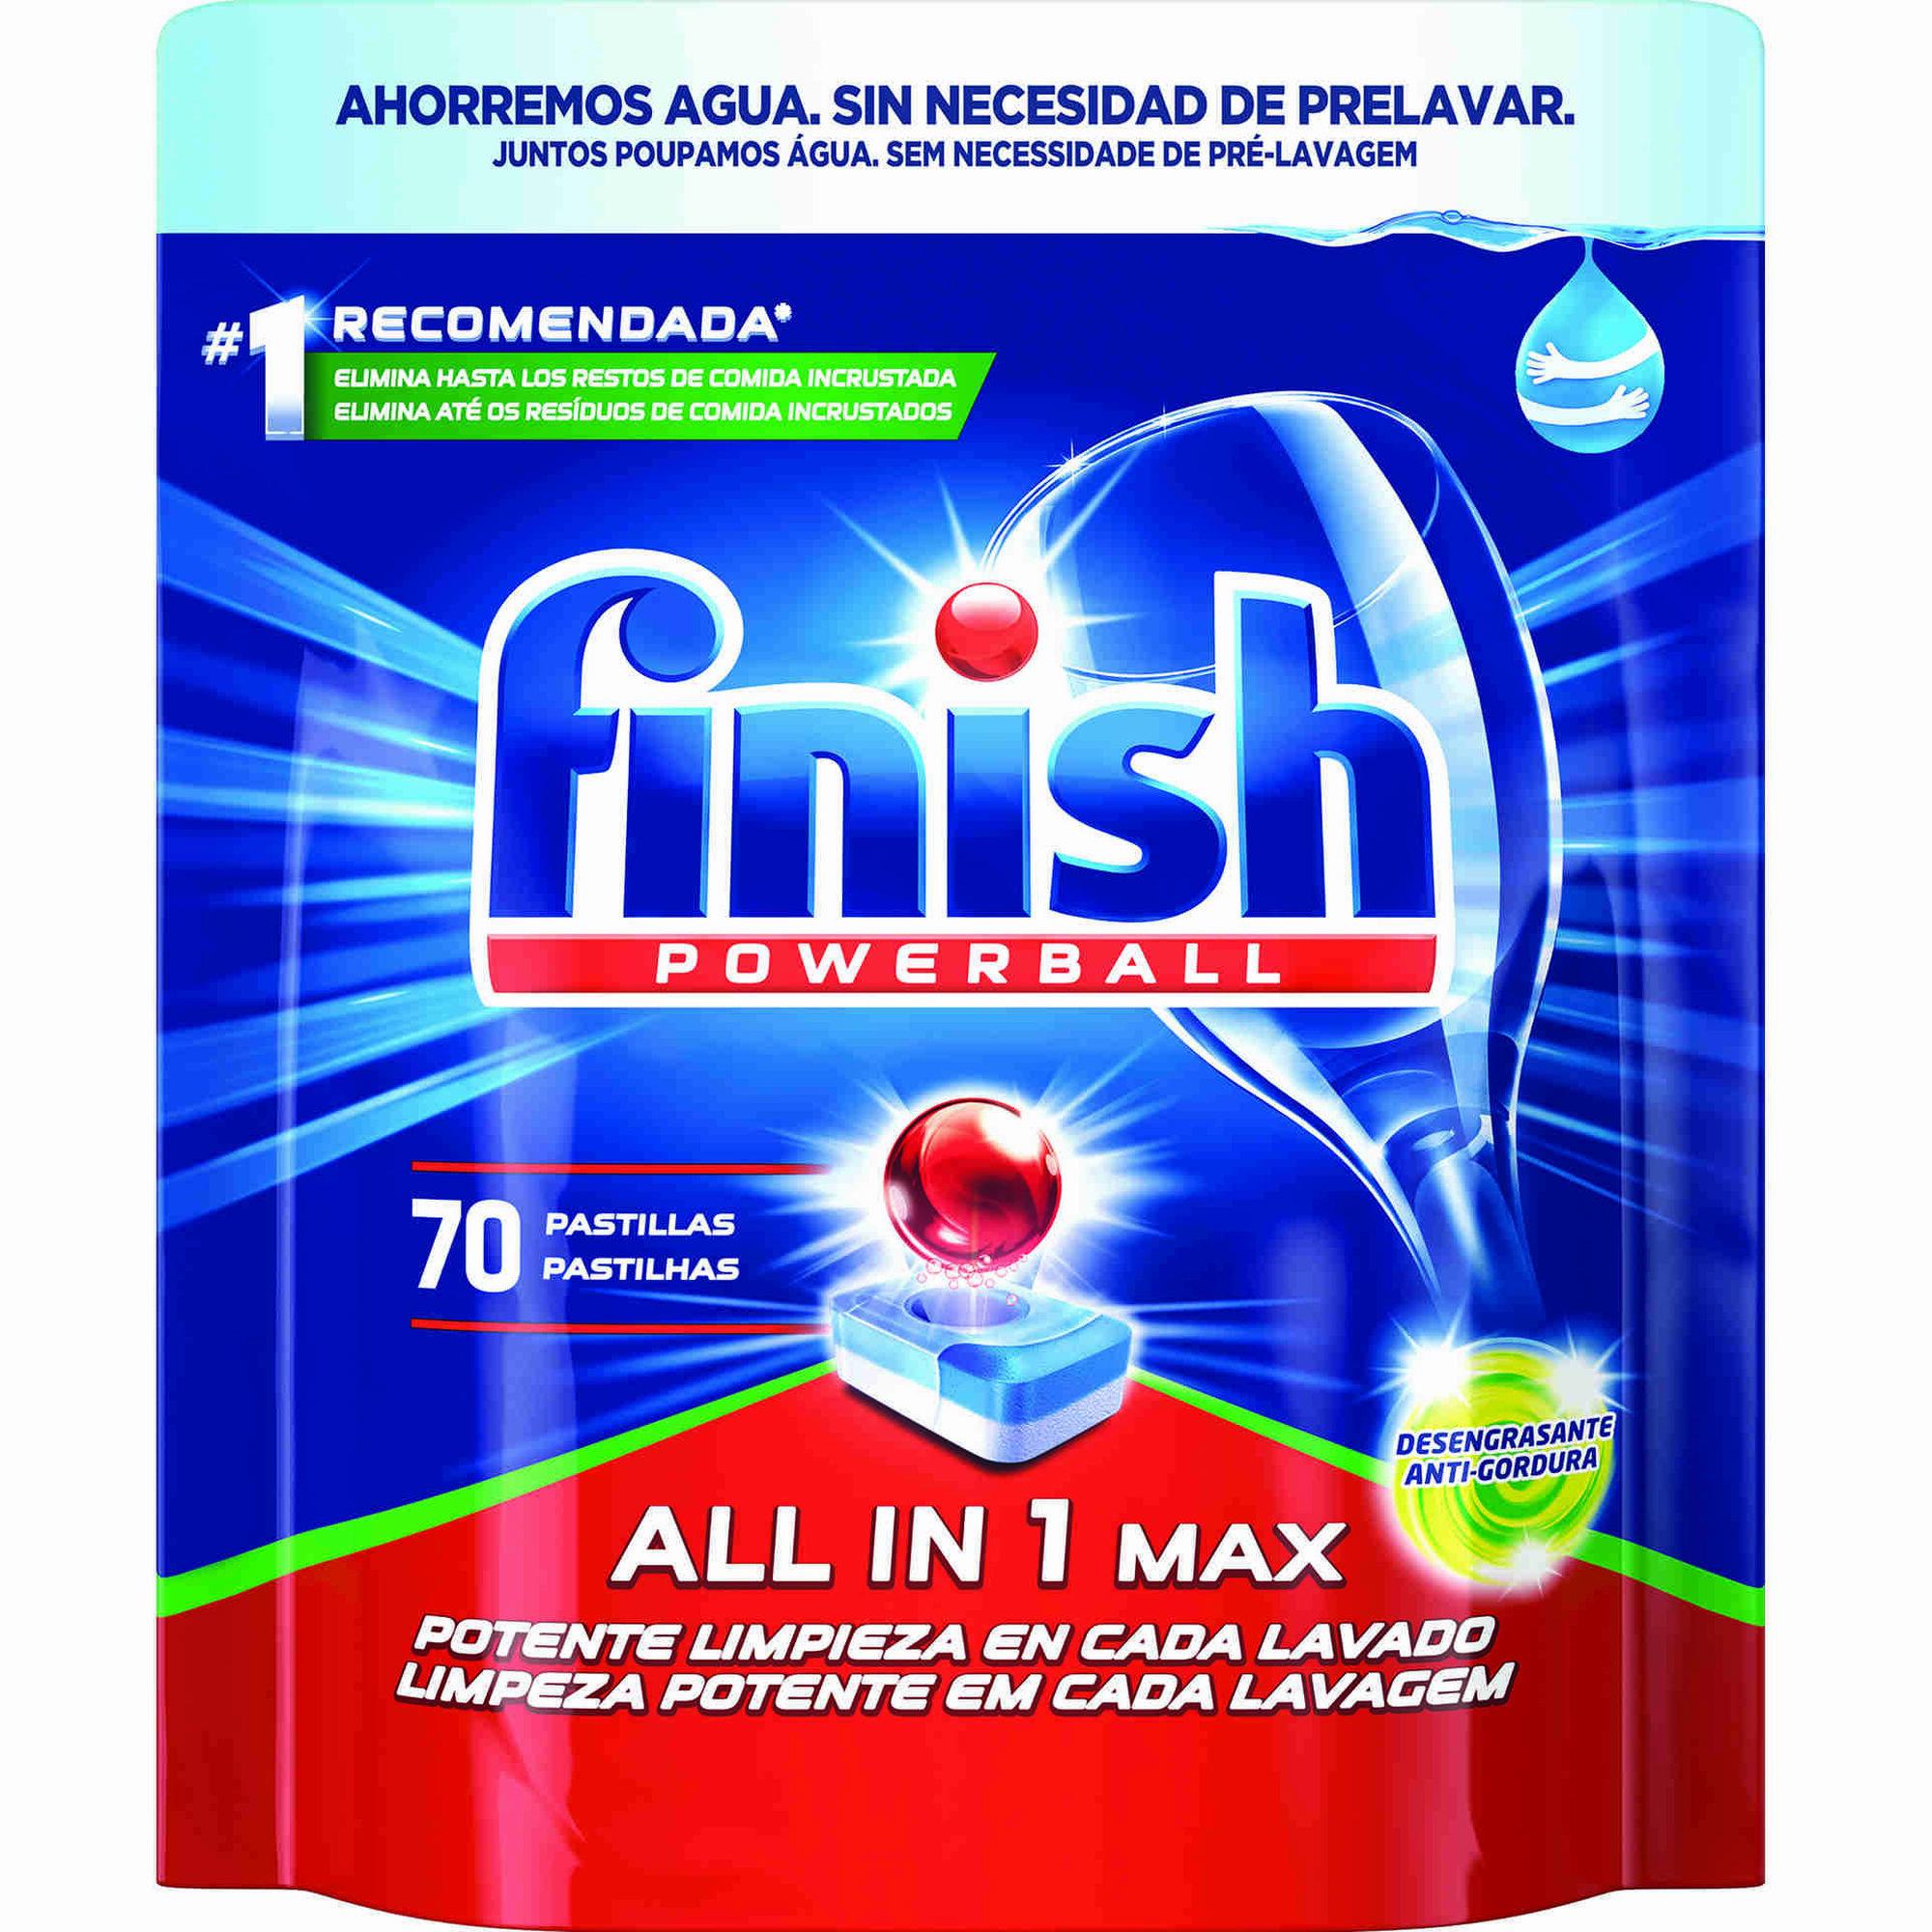 Detergente Máquina Loiça Pastilhas All in 1 Antigordura